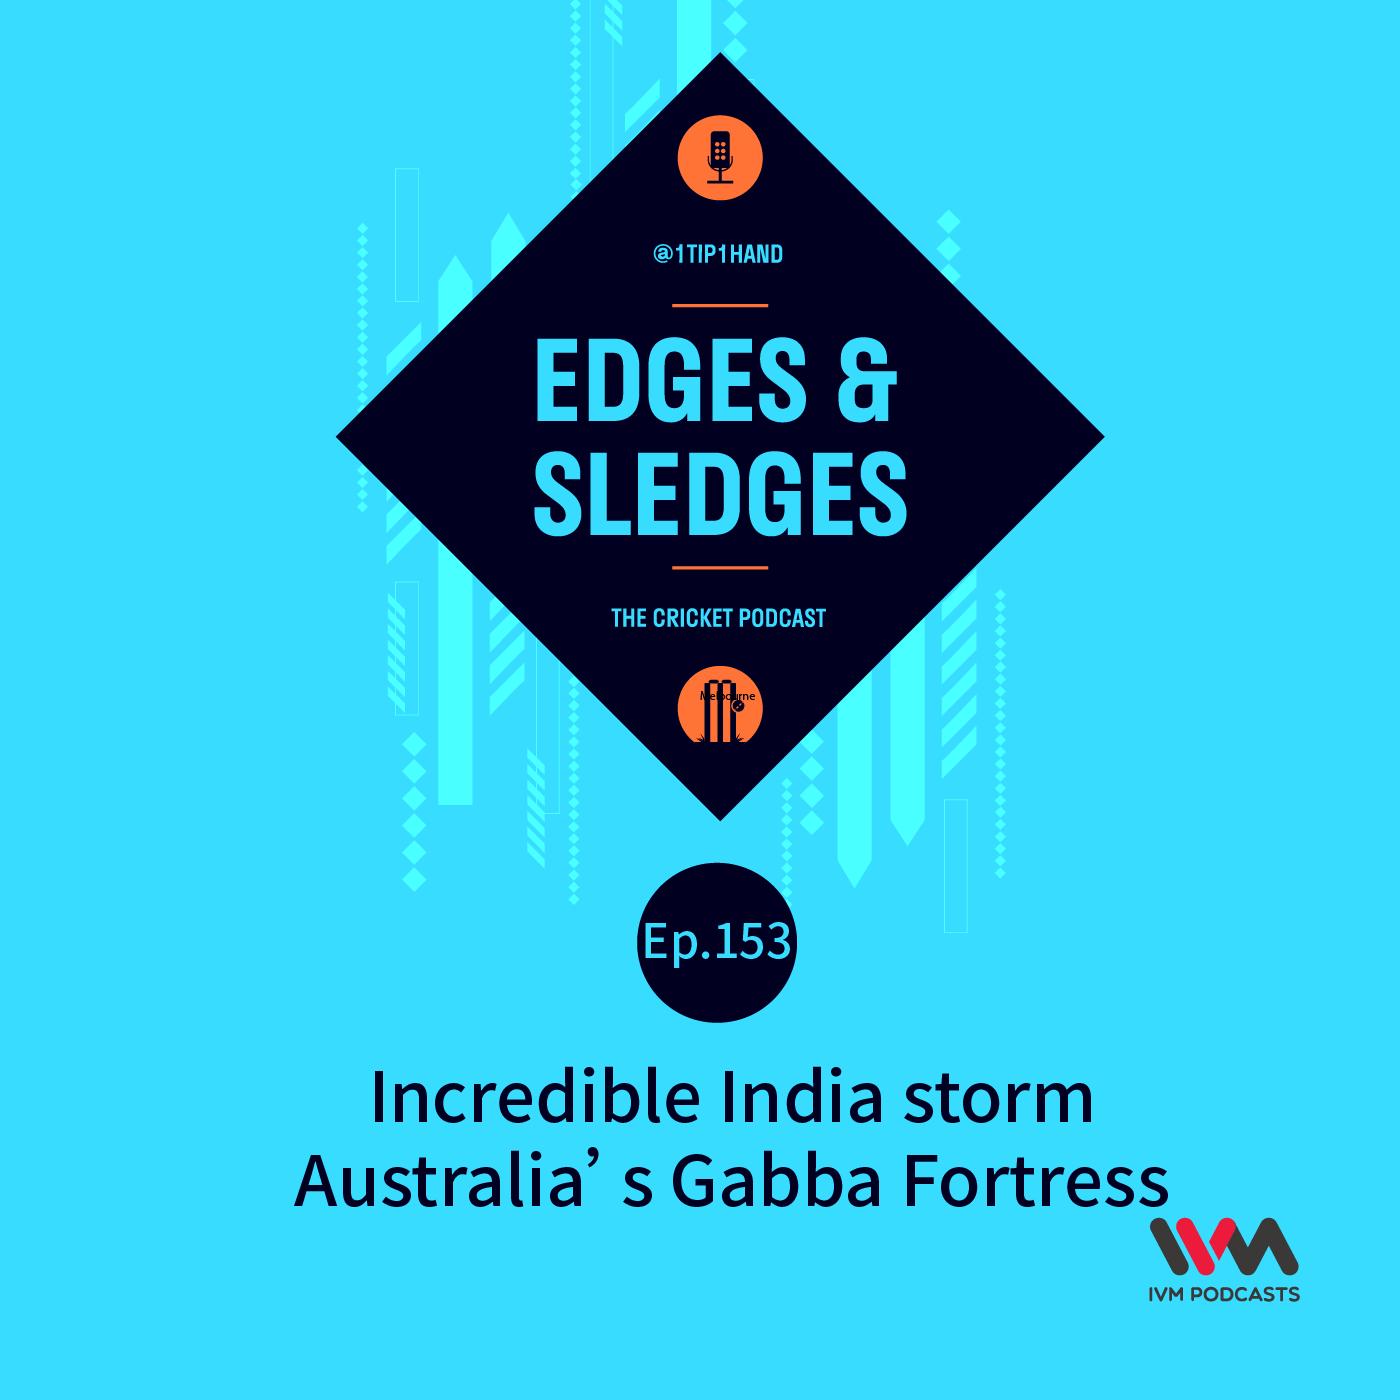 Ep.153: Incredible India storm Australia's Gabba Fortress